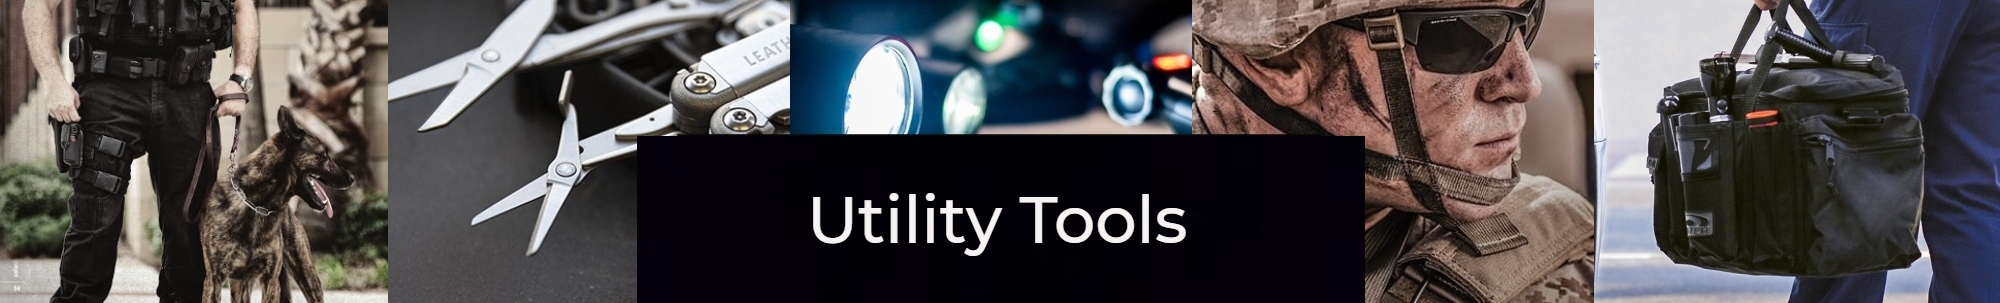 Equipment-utility.jpg